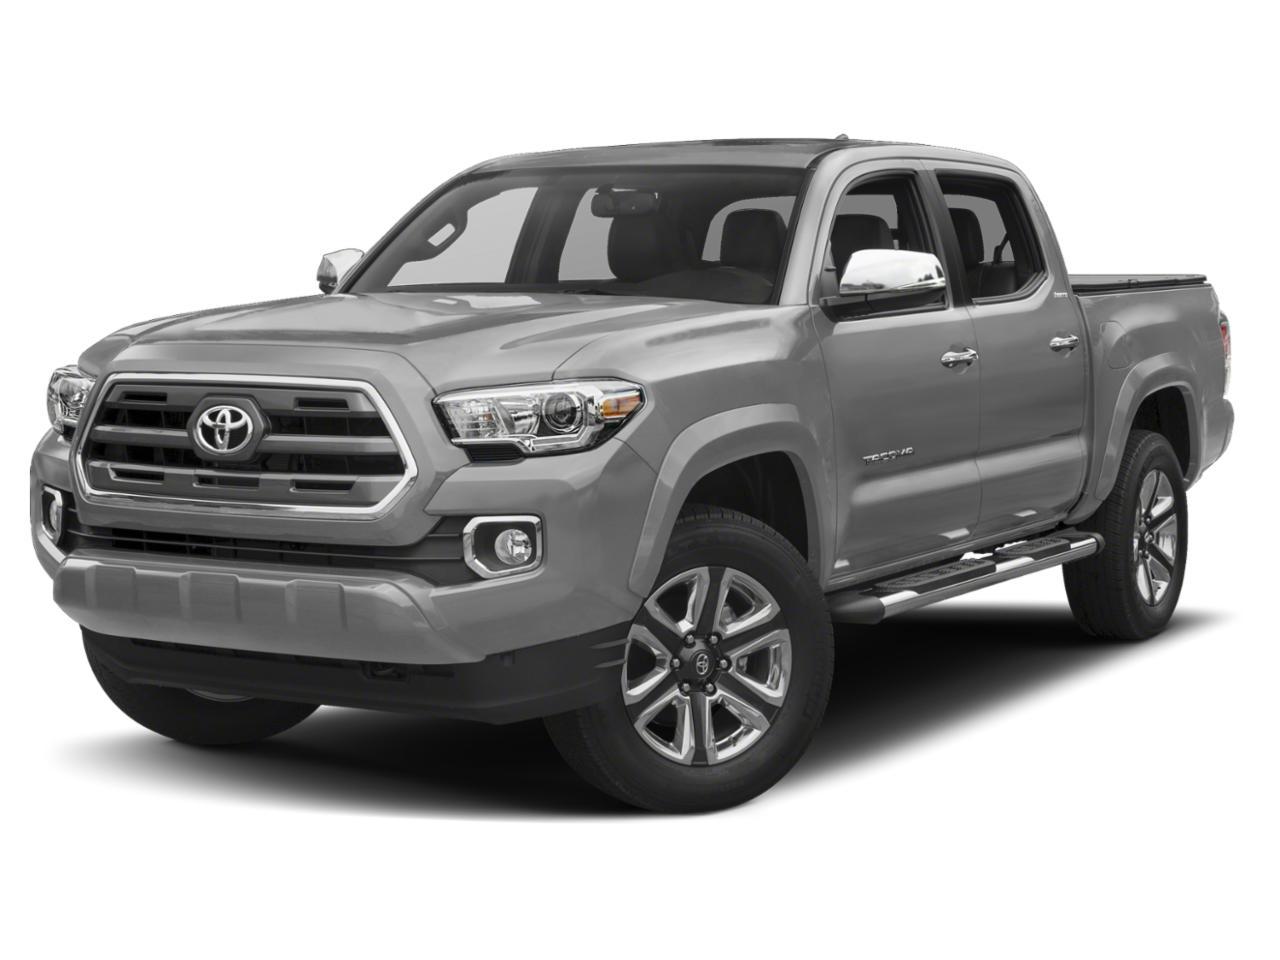 2018 Toyota Tacoma Vehicle Photo in Novato, CA 94945